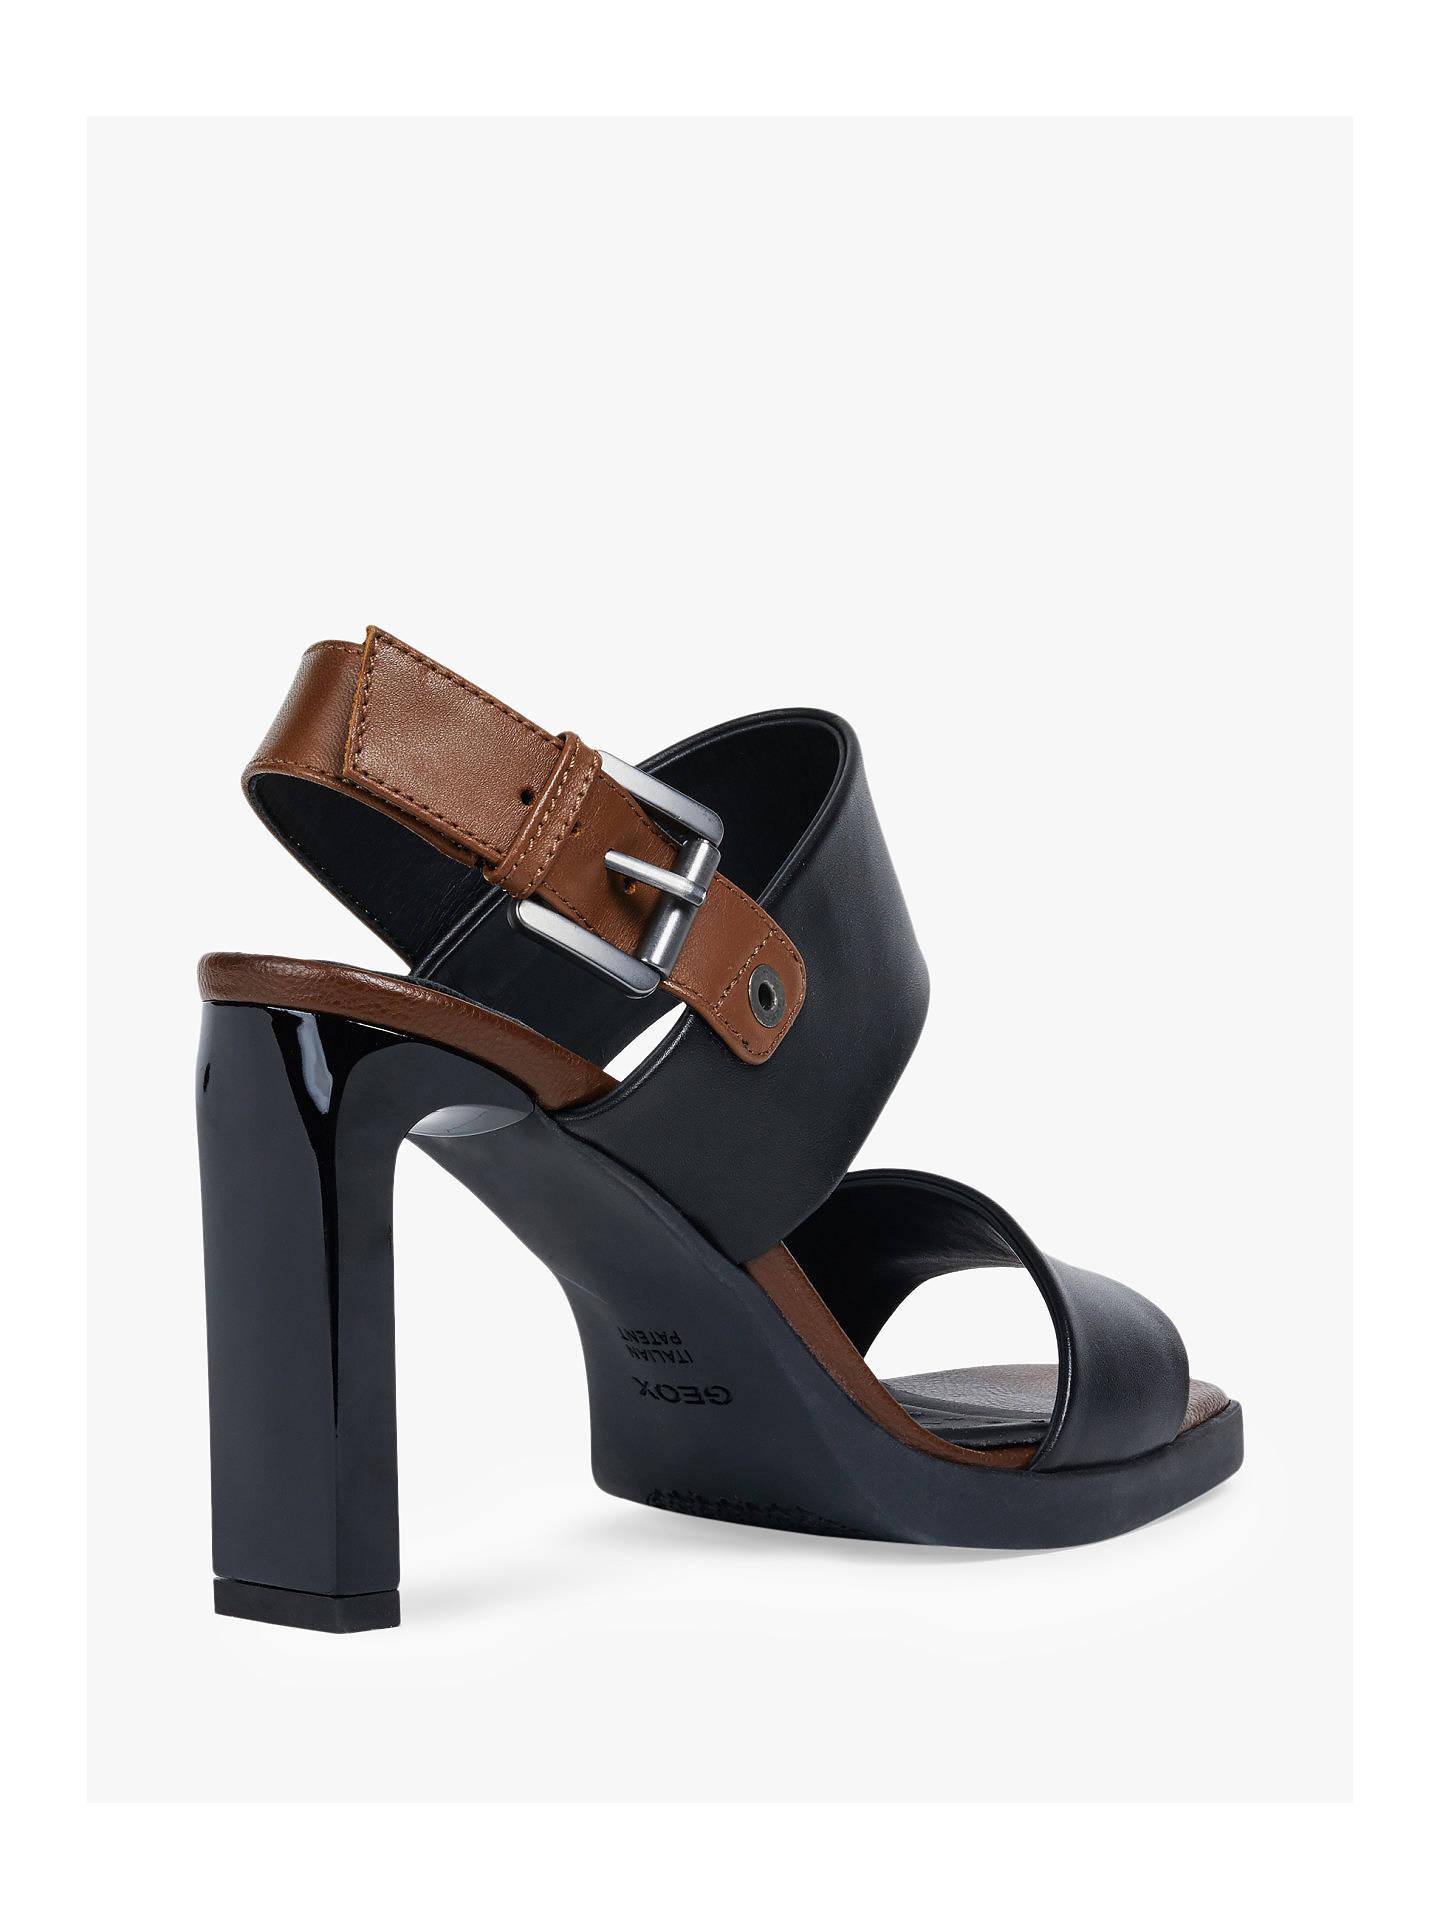 22b2e8c55d4 Geox Women s Jenieve Heeled Sandals at John Lewis   Partners